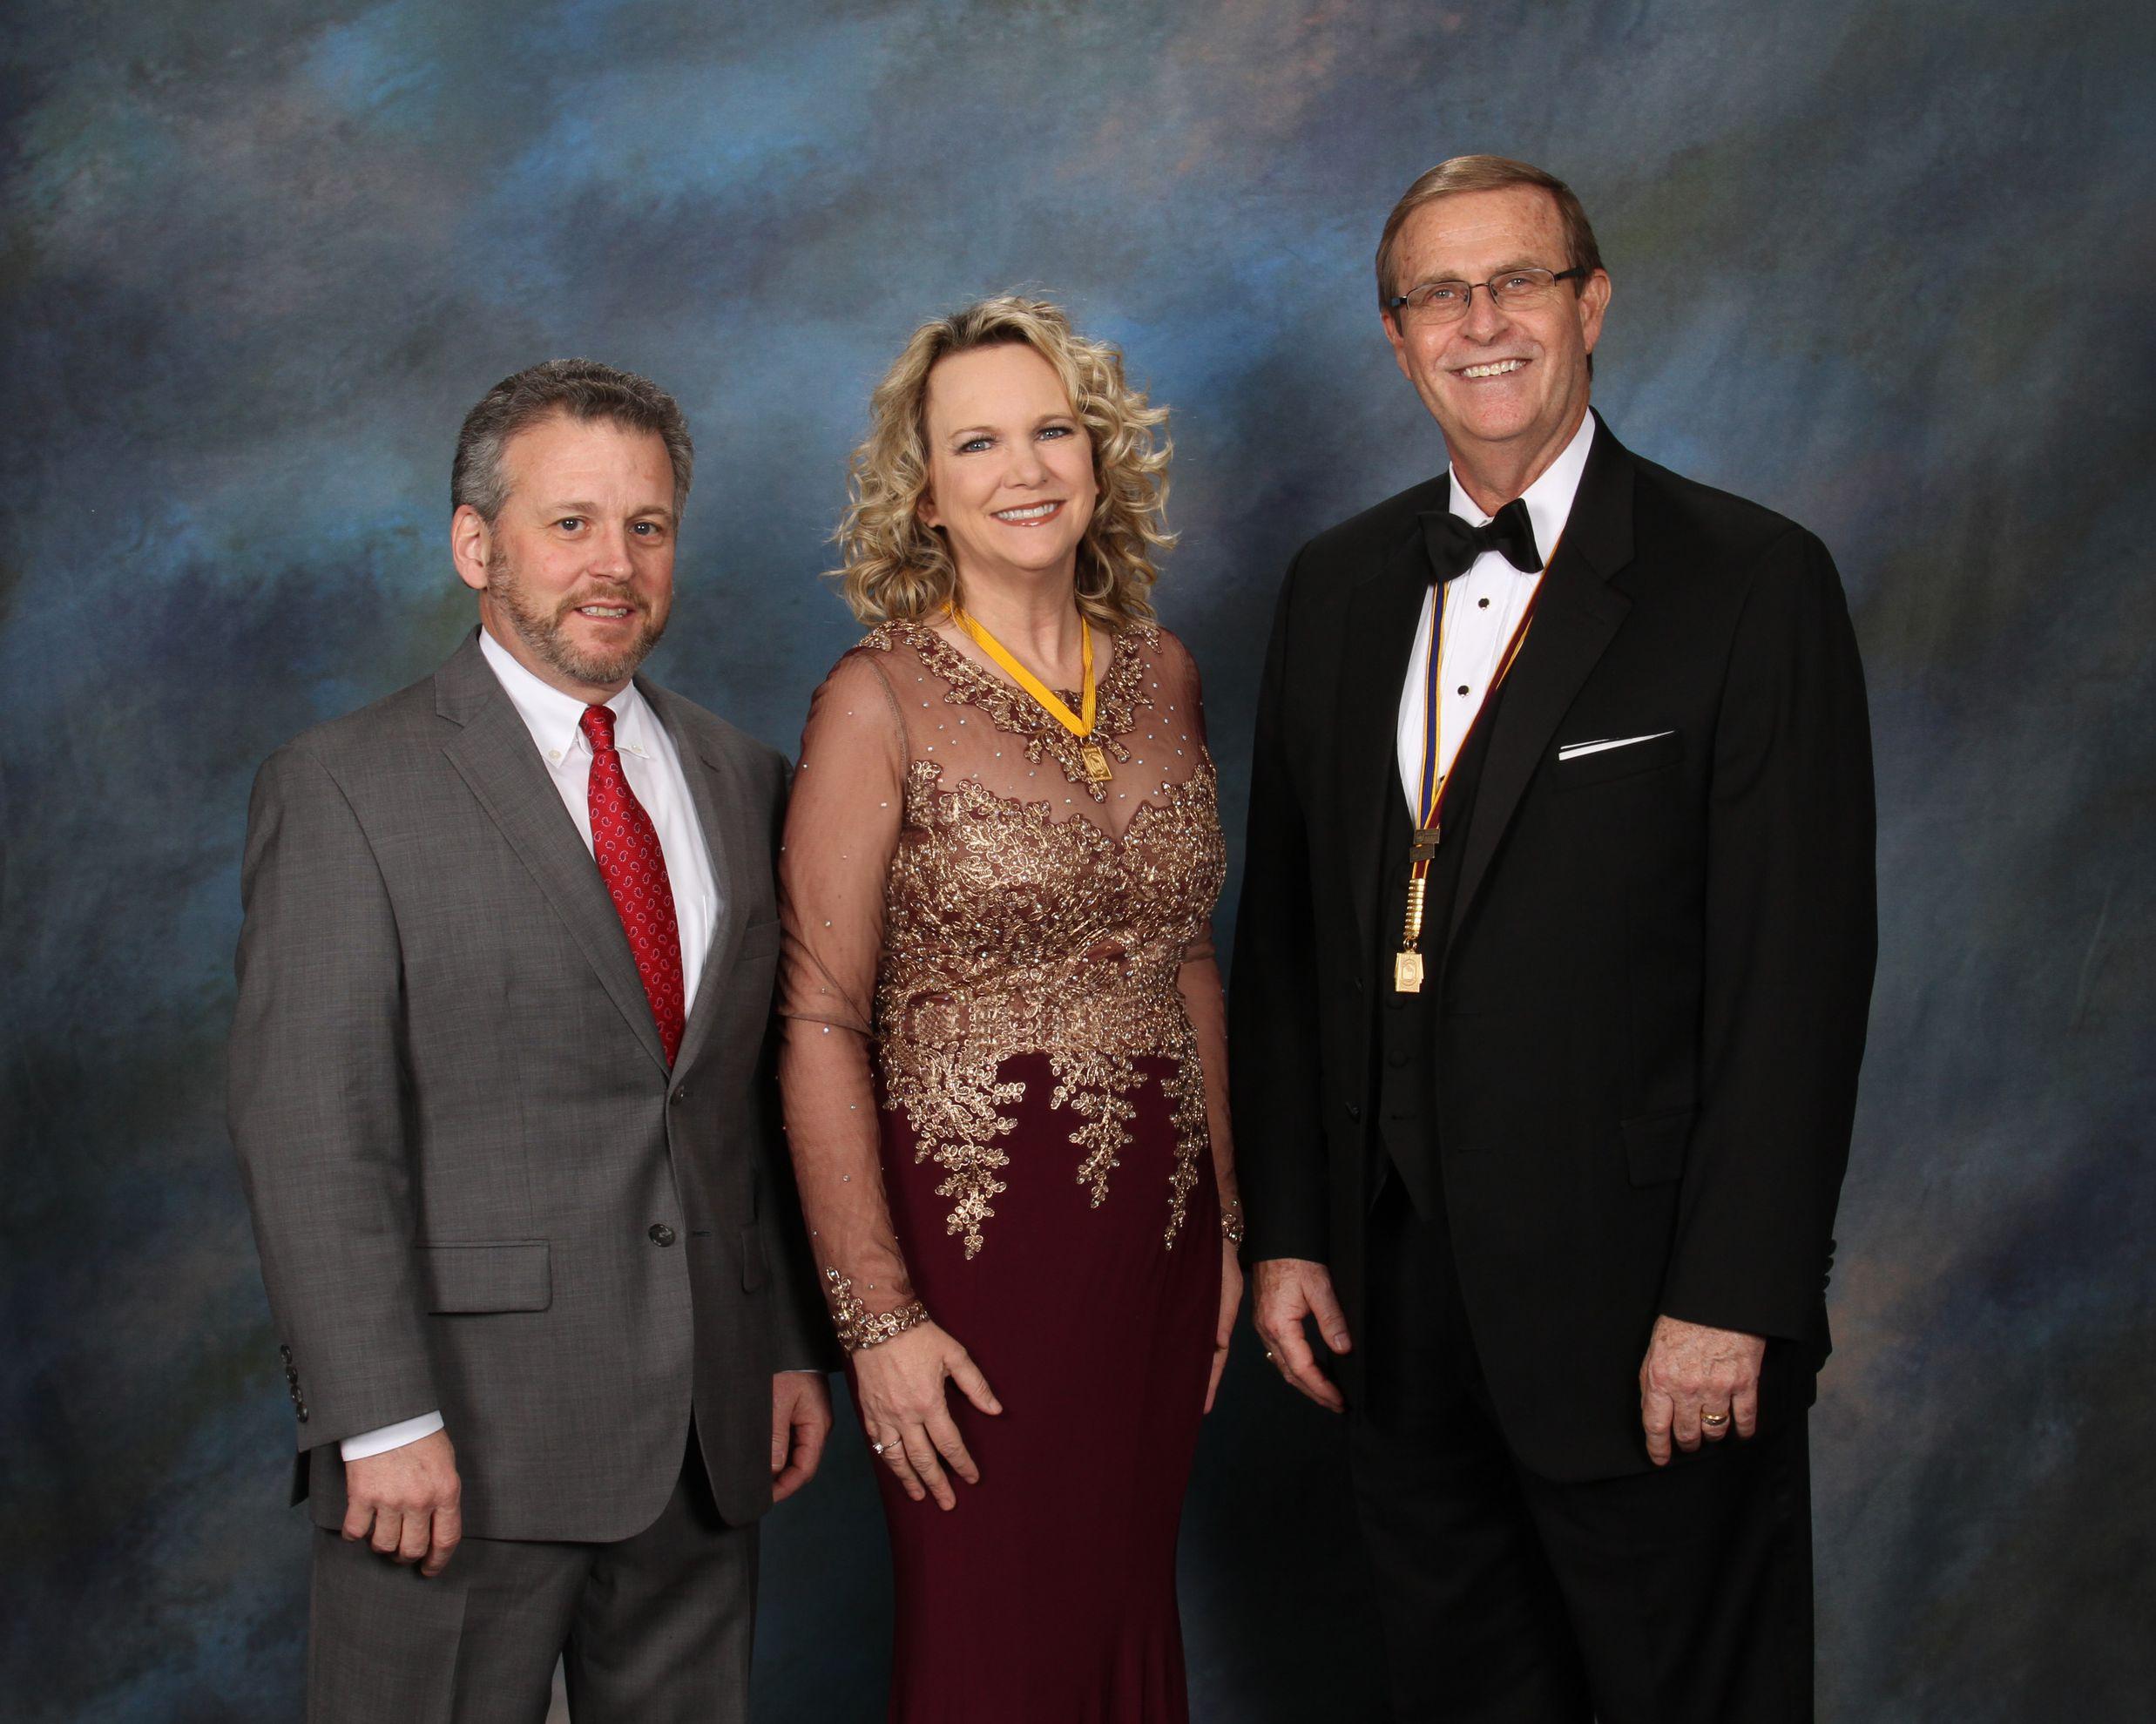 Doug Kolbenschlag (sponsor),  Lori Kolbenschlag, M. Photog., CPP,  Stephen Thetford PPA President